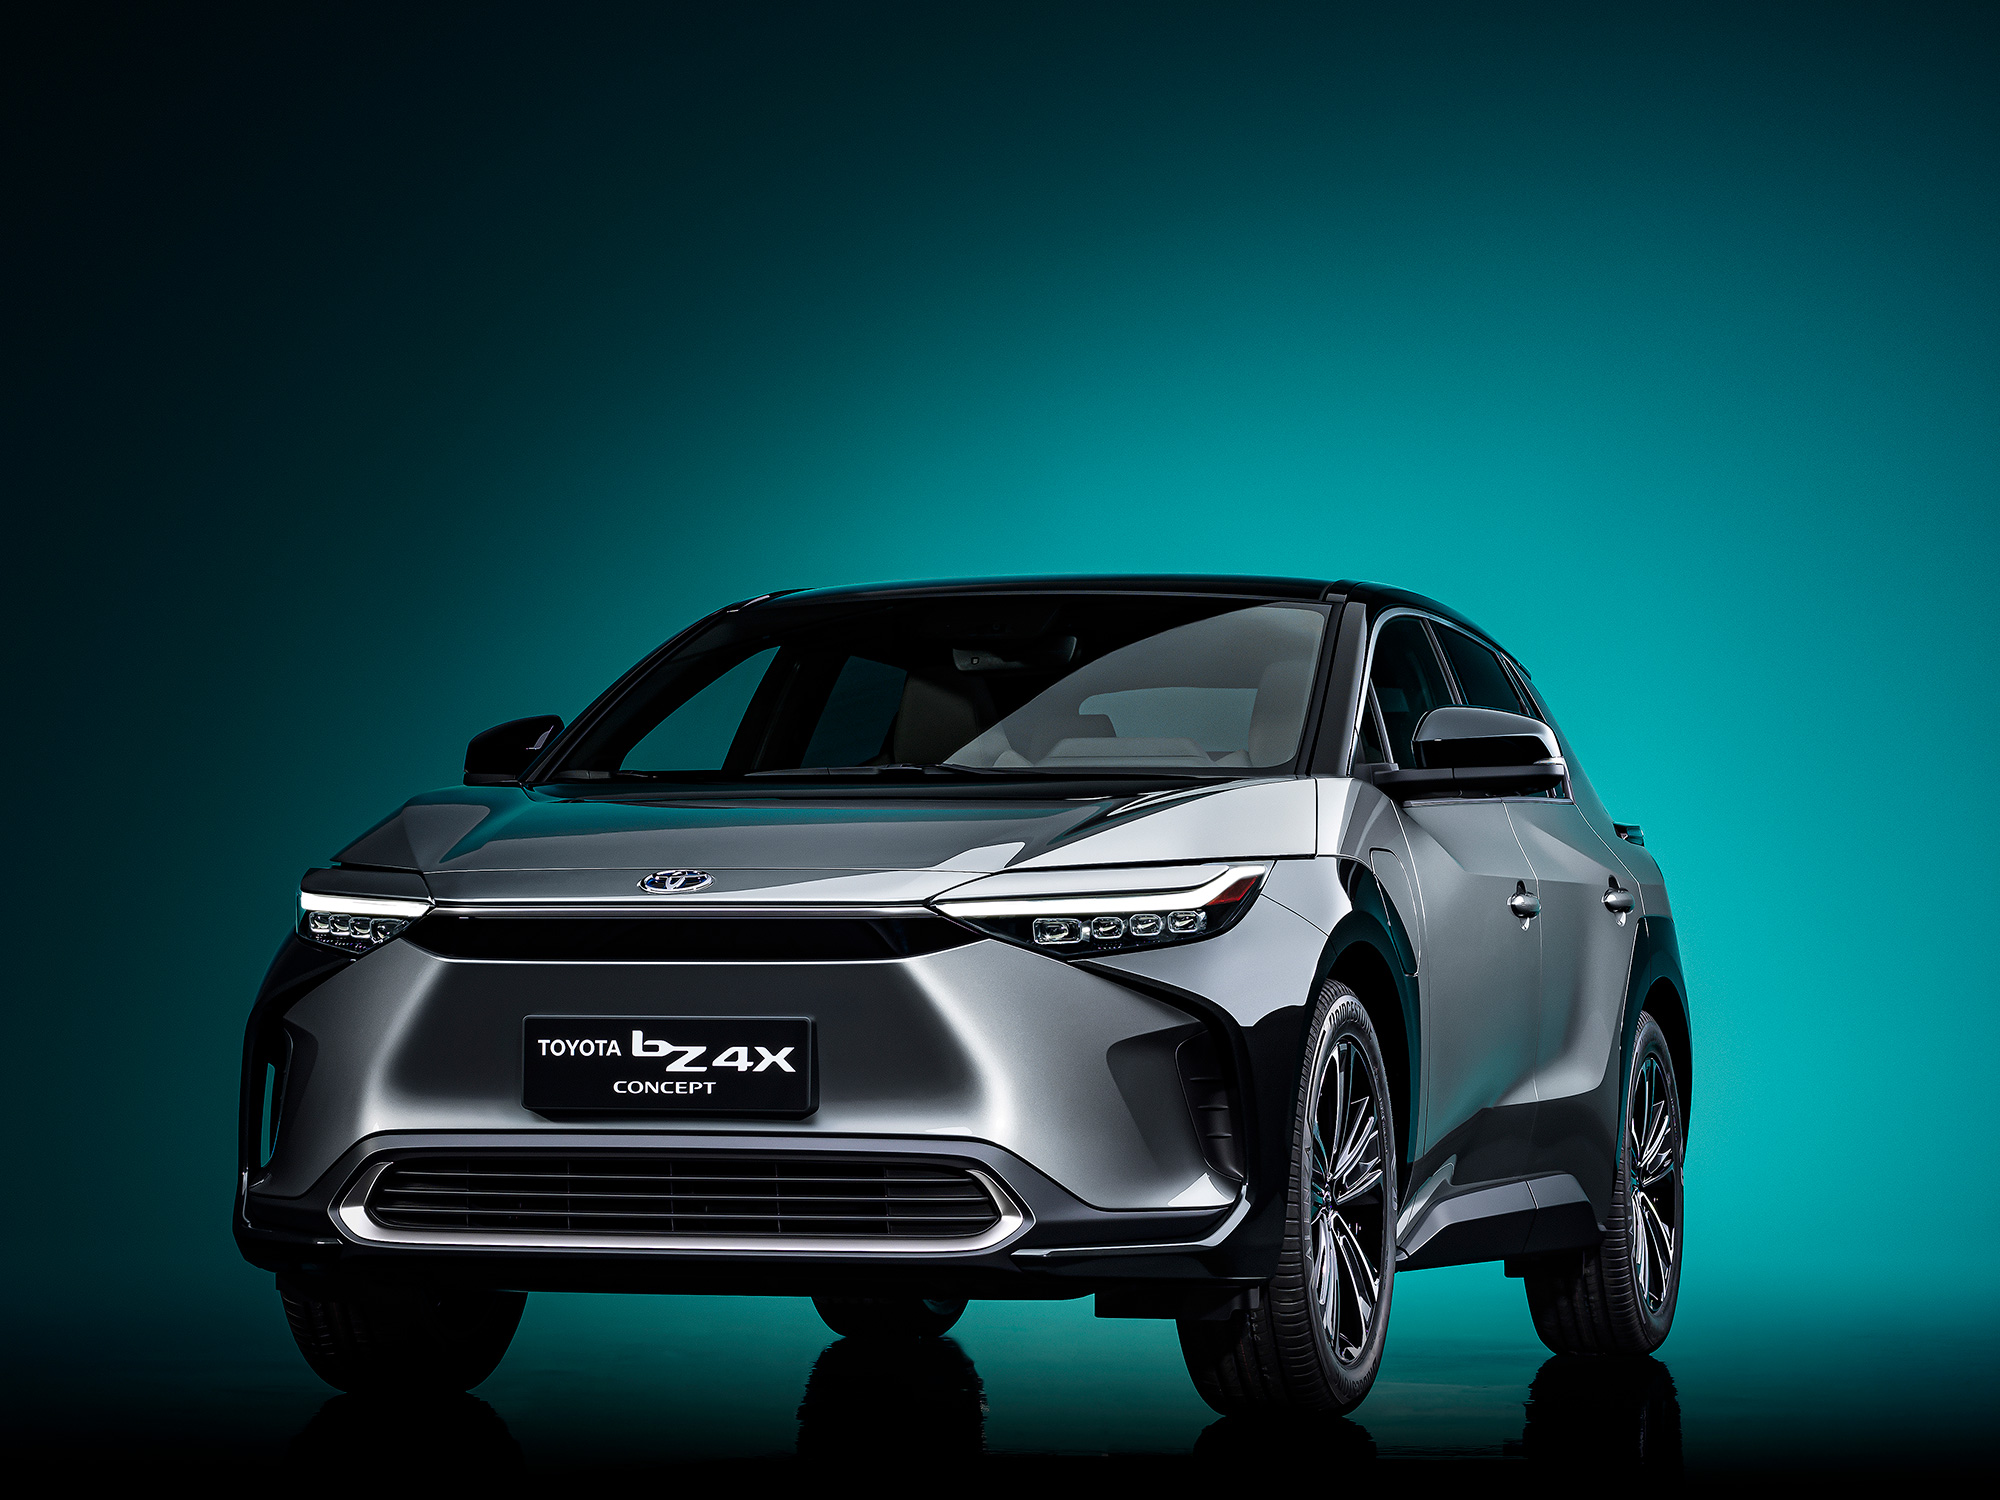 Toyota bZ4X concepto